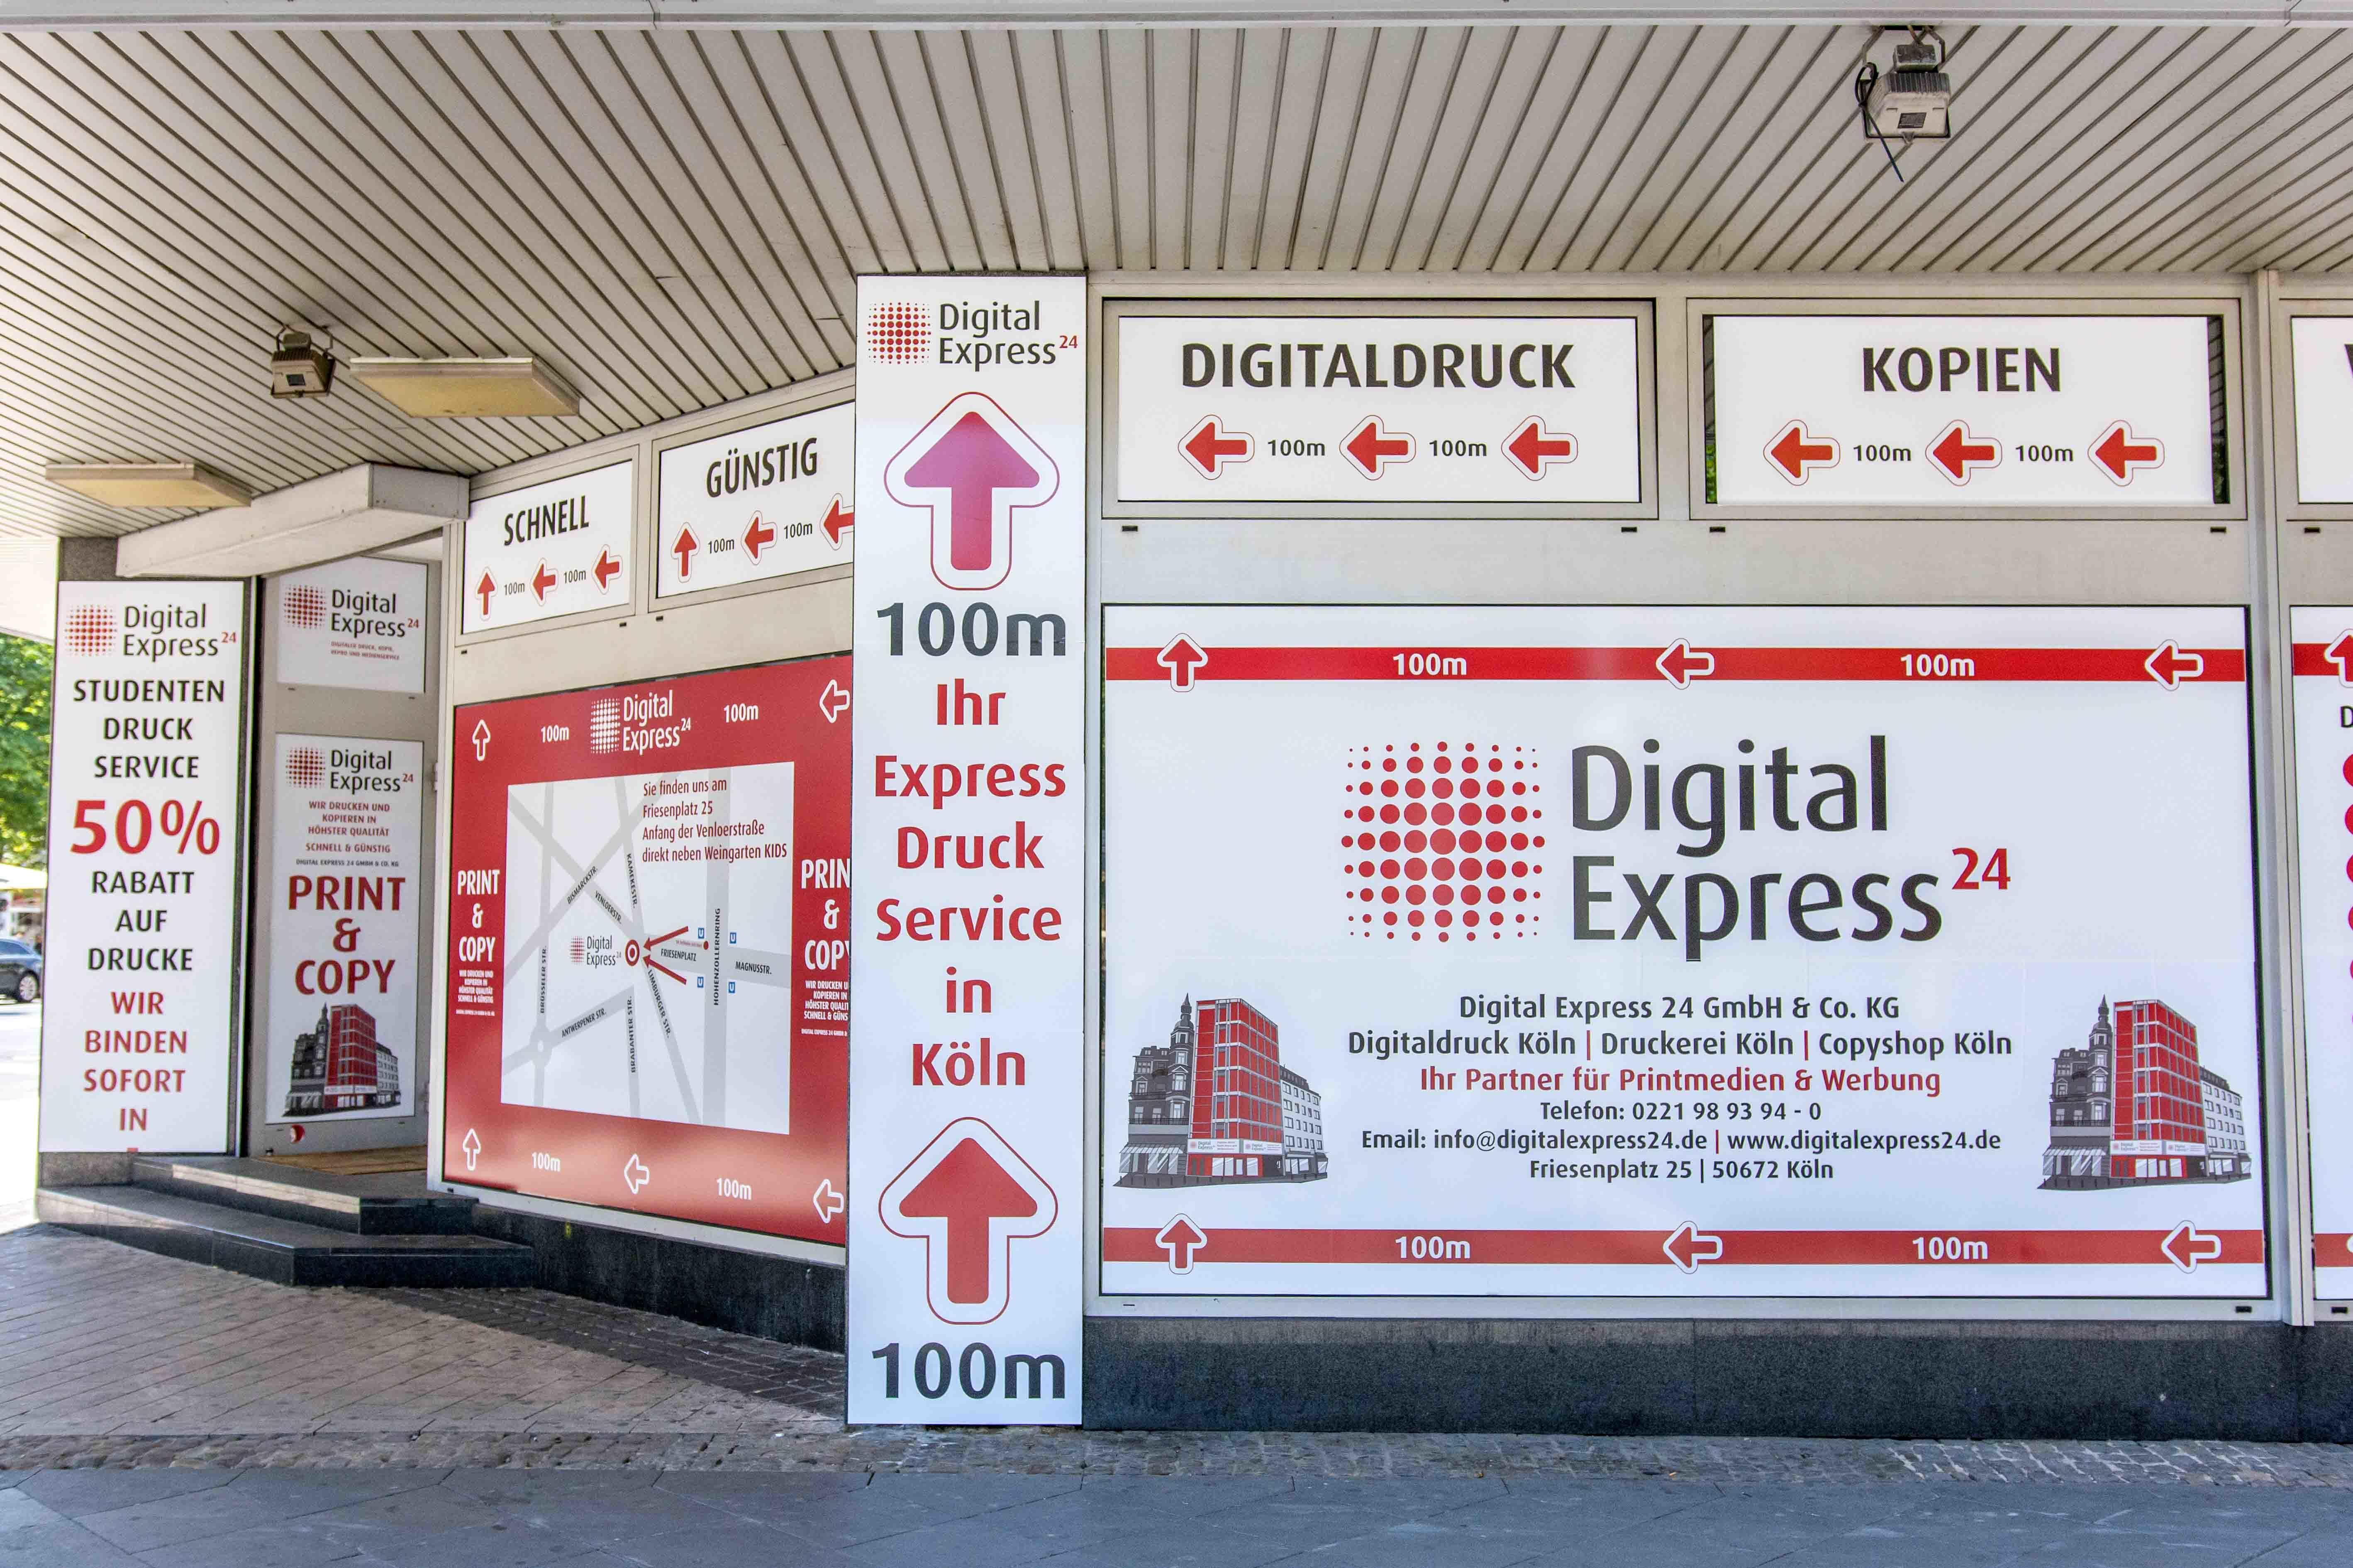 Fotos de Express Druckerei+Copyshop Nr. 1 in Köln: Digital Express 24